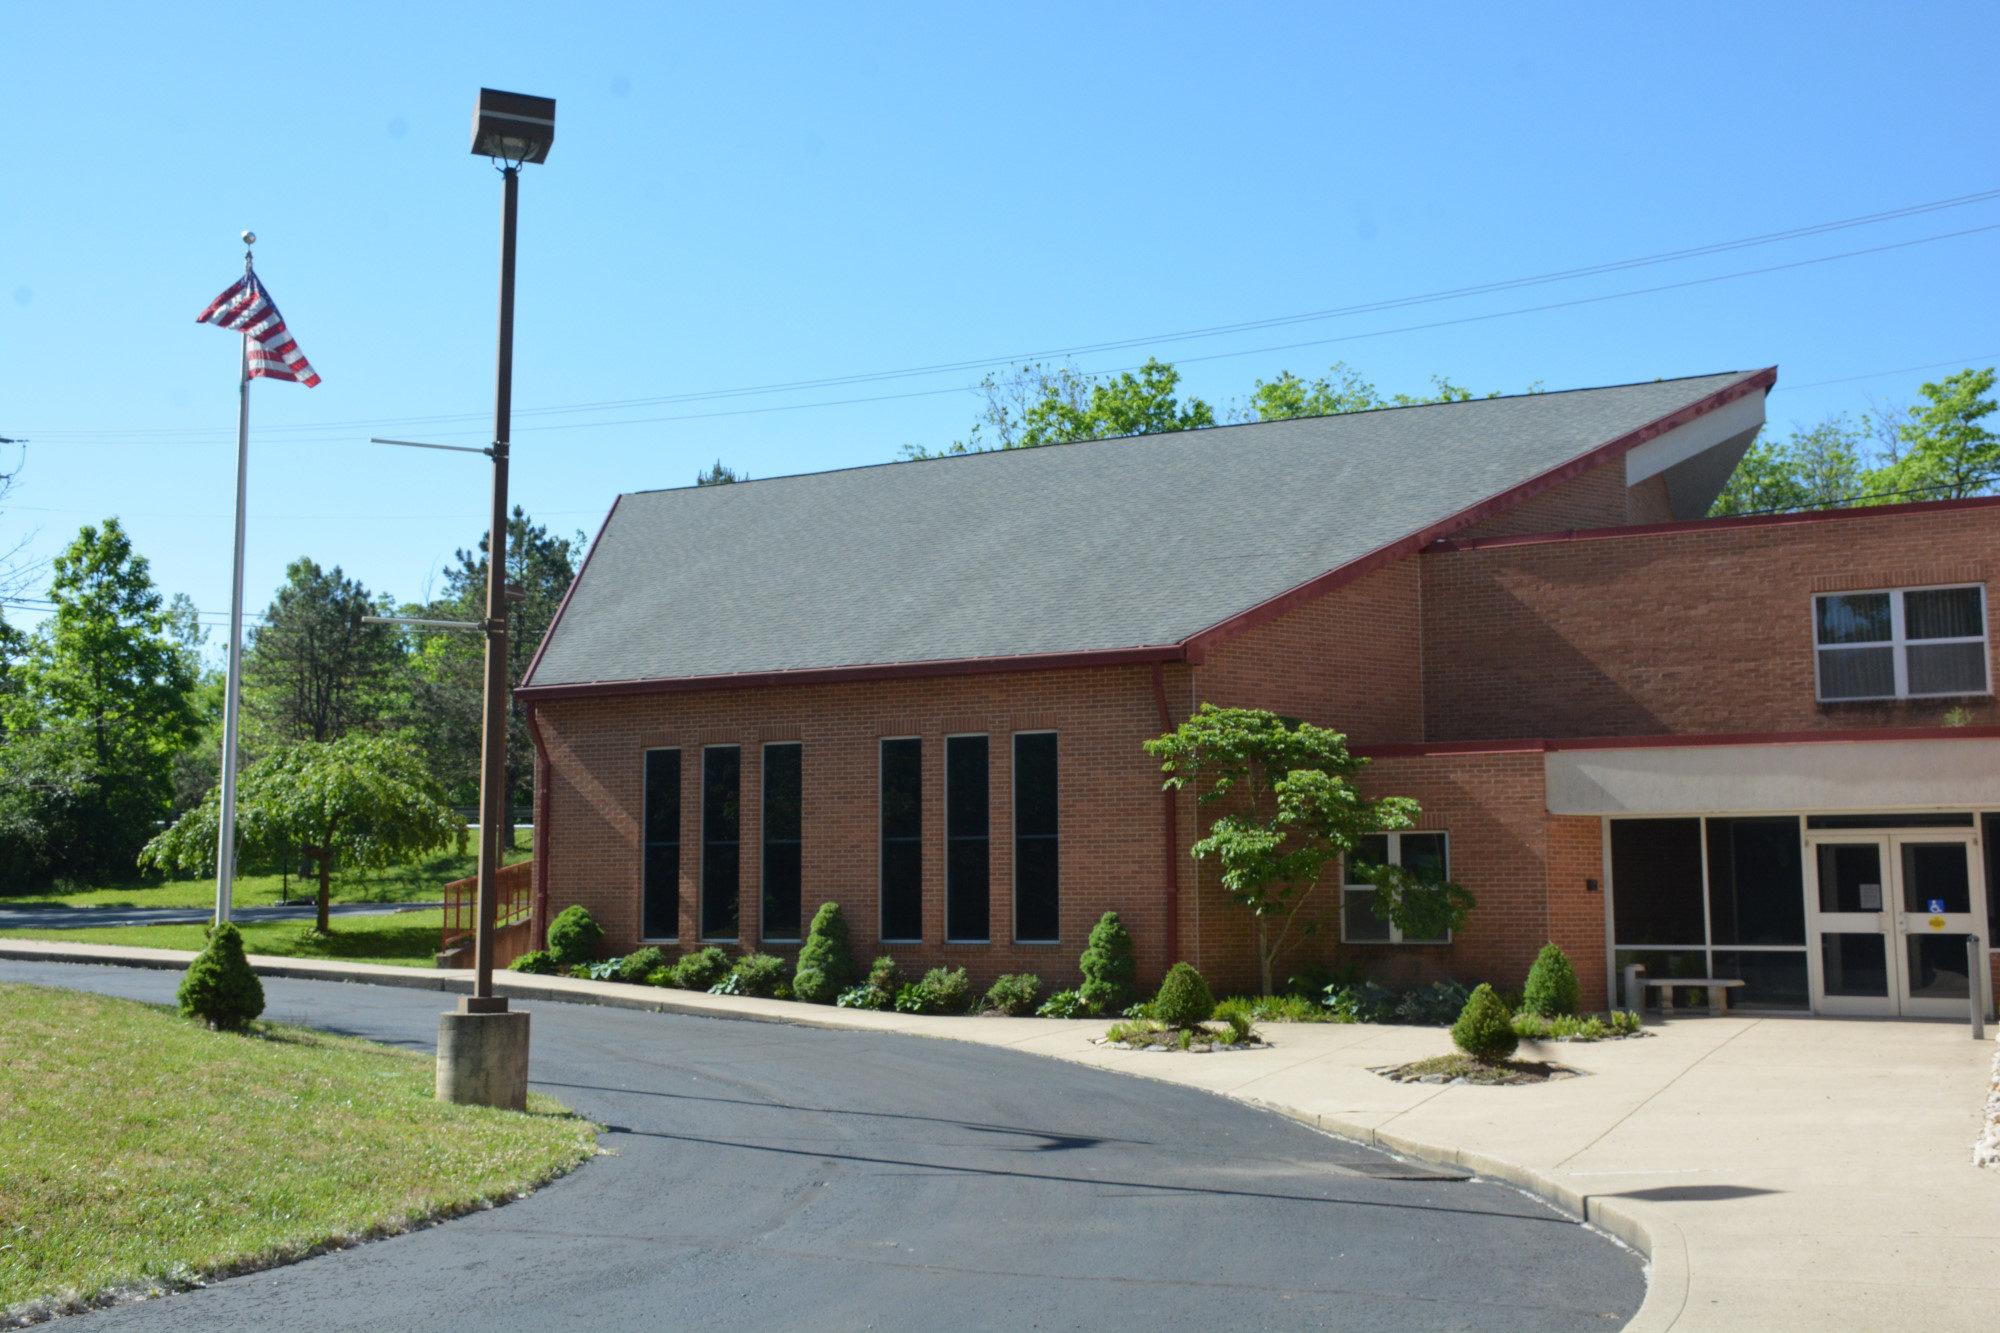 St. John's Lutheran Church - Miamisburg, OH